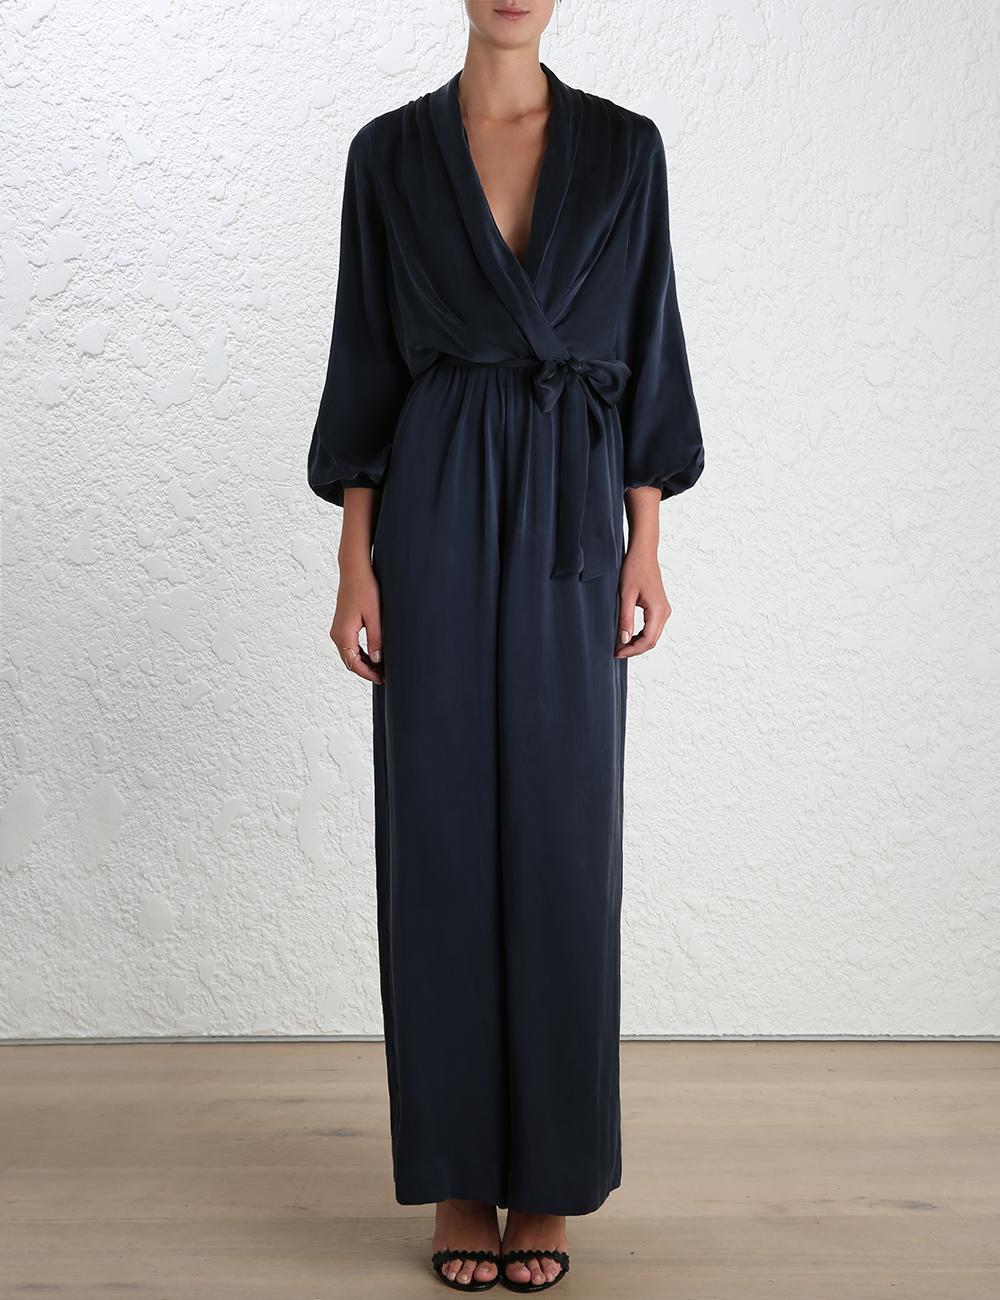 6d8560c130a Lyst - Zimmermann Sueded Silk Wrap Jumpsuit in Black